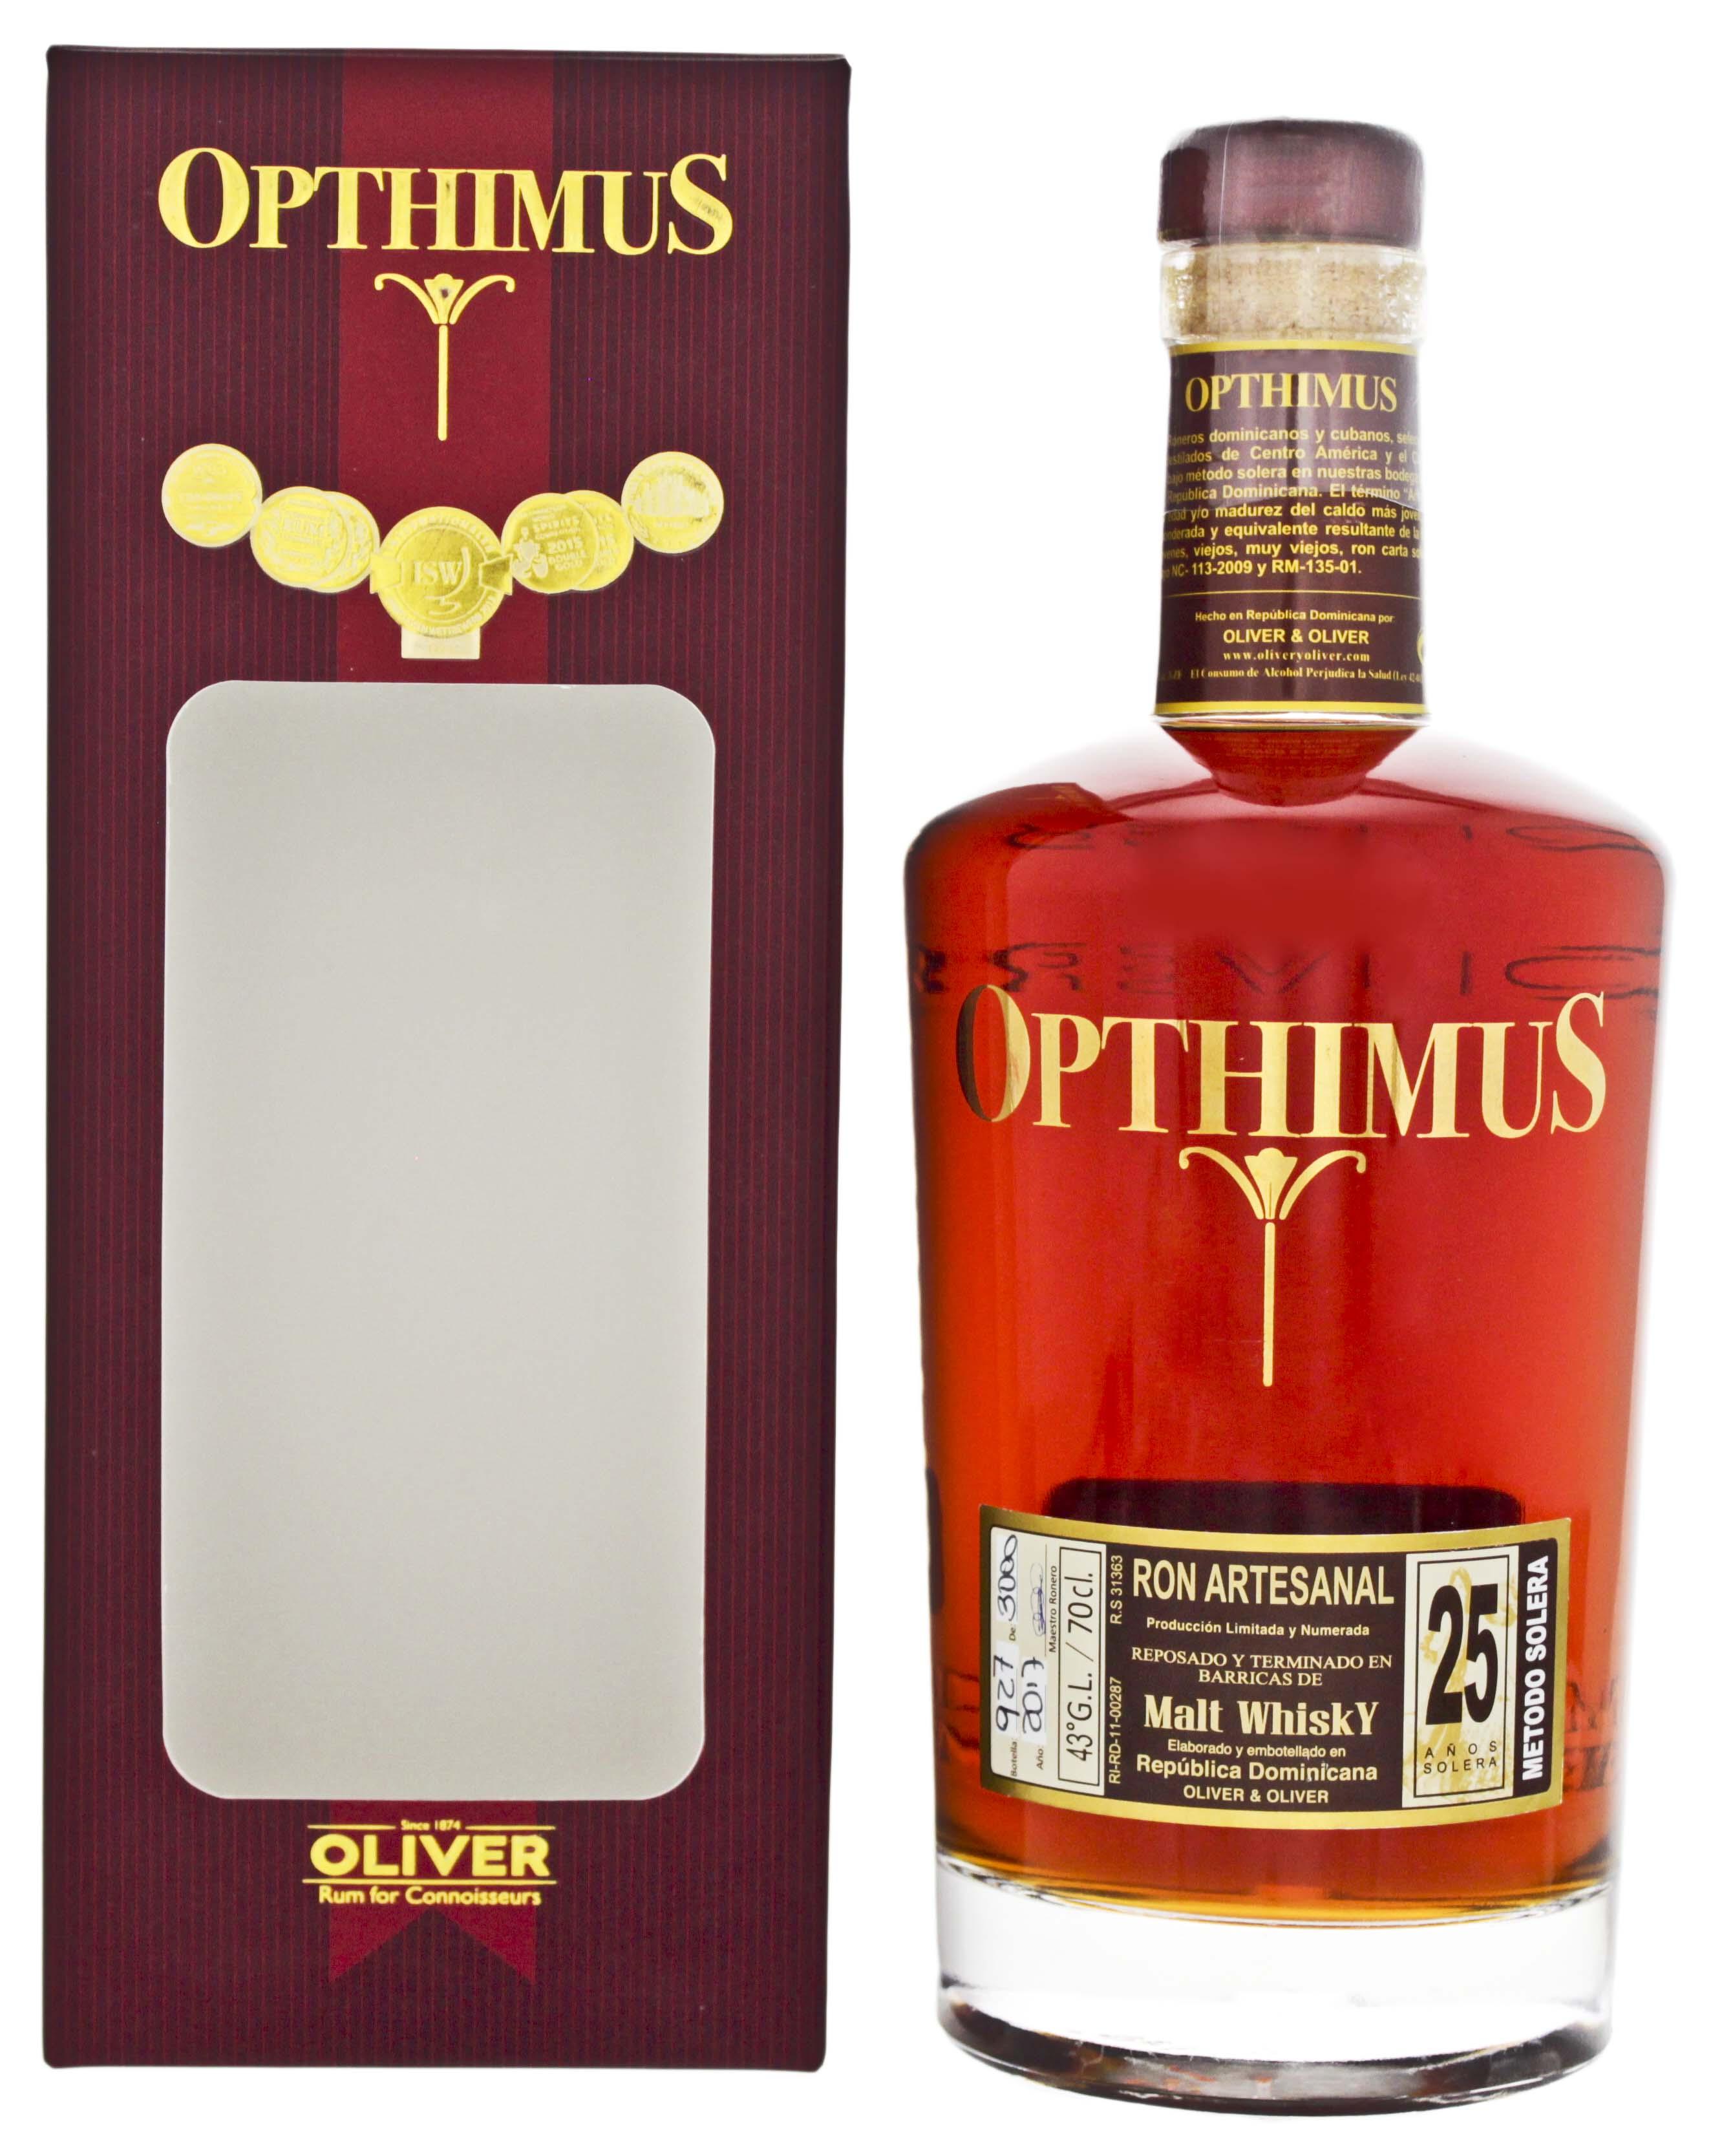 Opthimus 25YO Malt Whisky Finish 0,7L